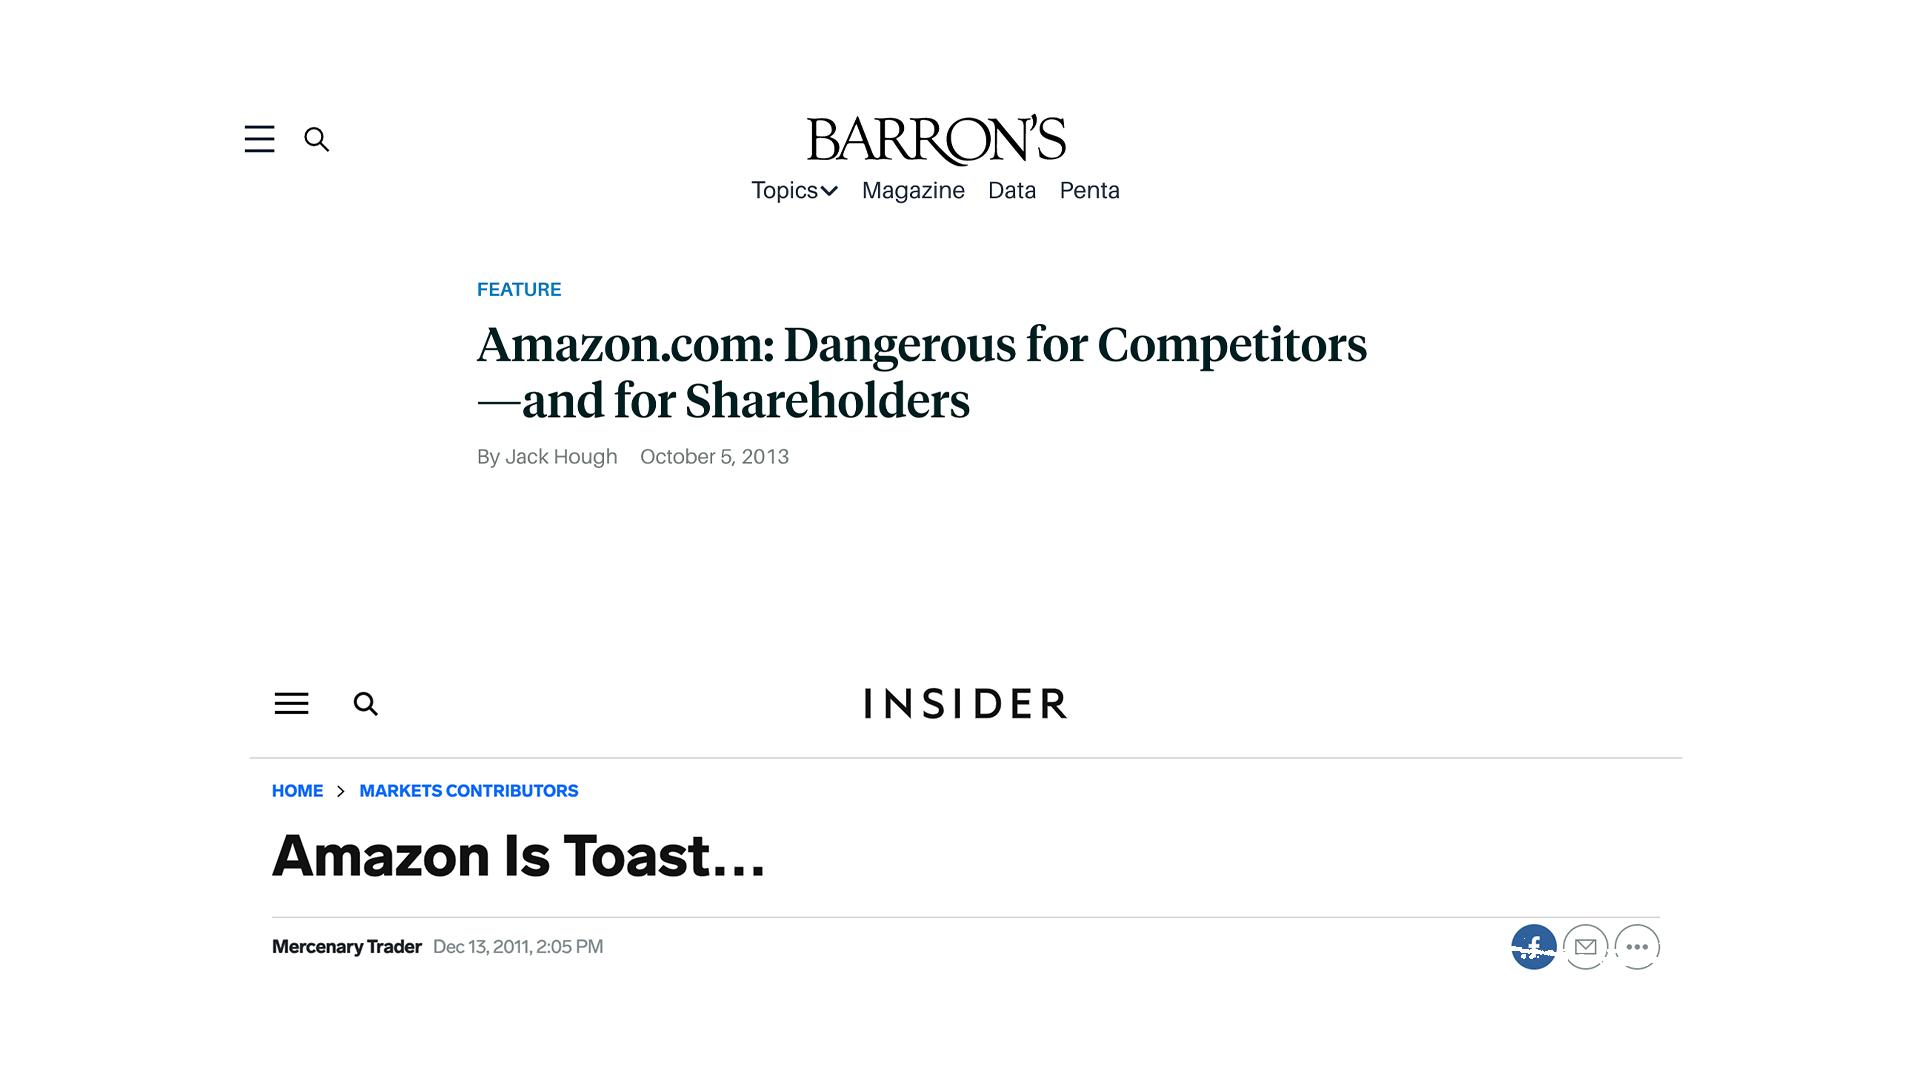 barrons-and-insider-headlines